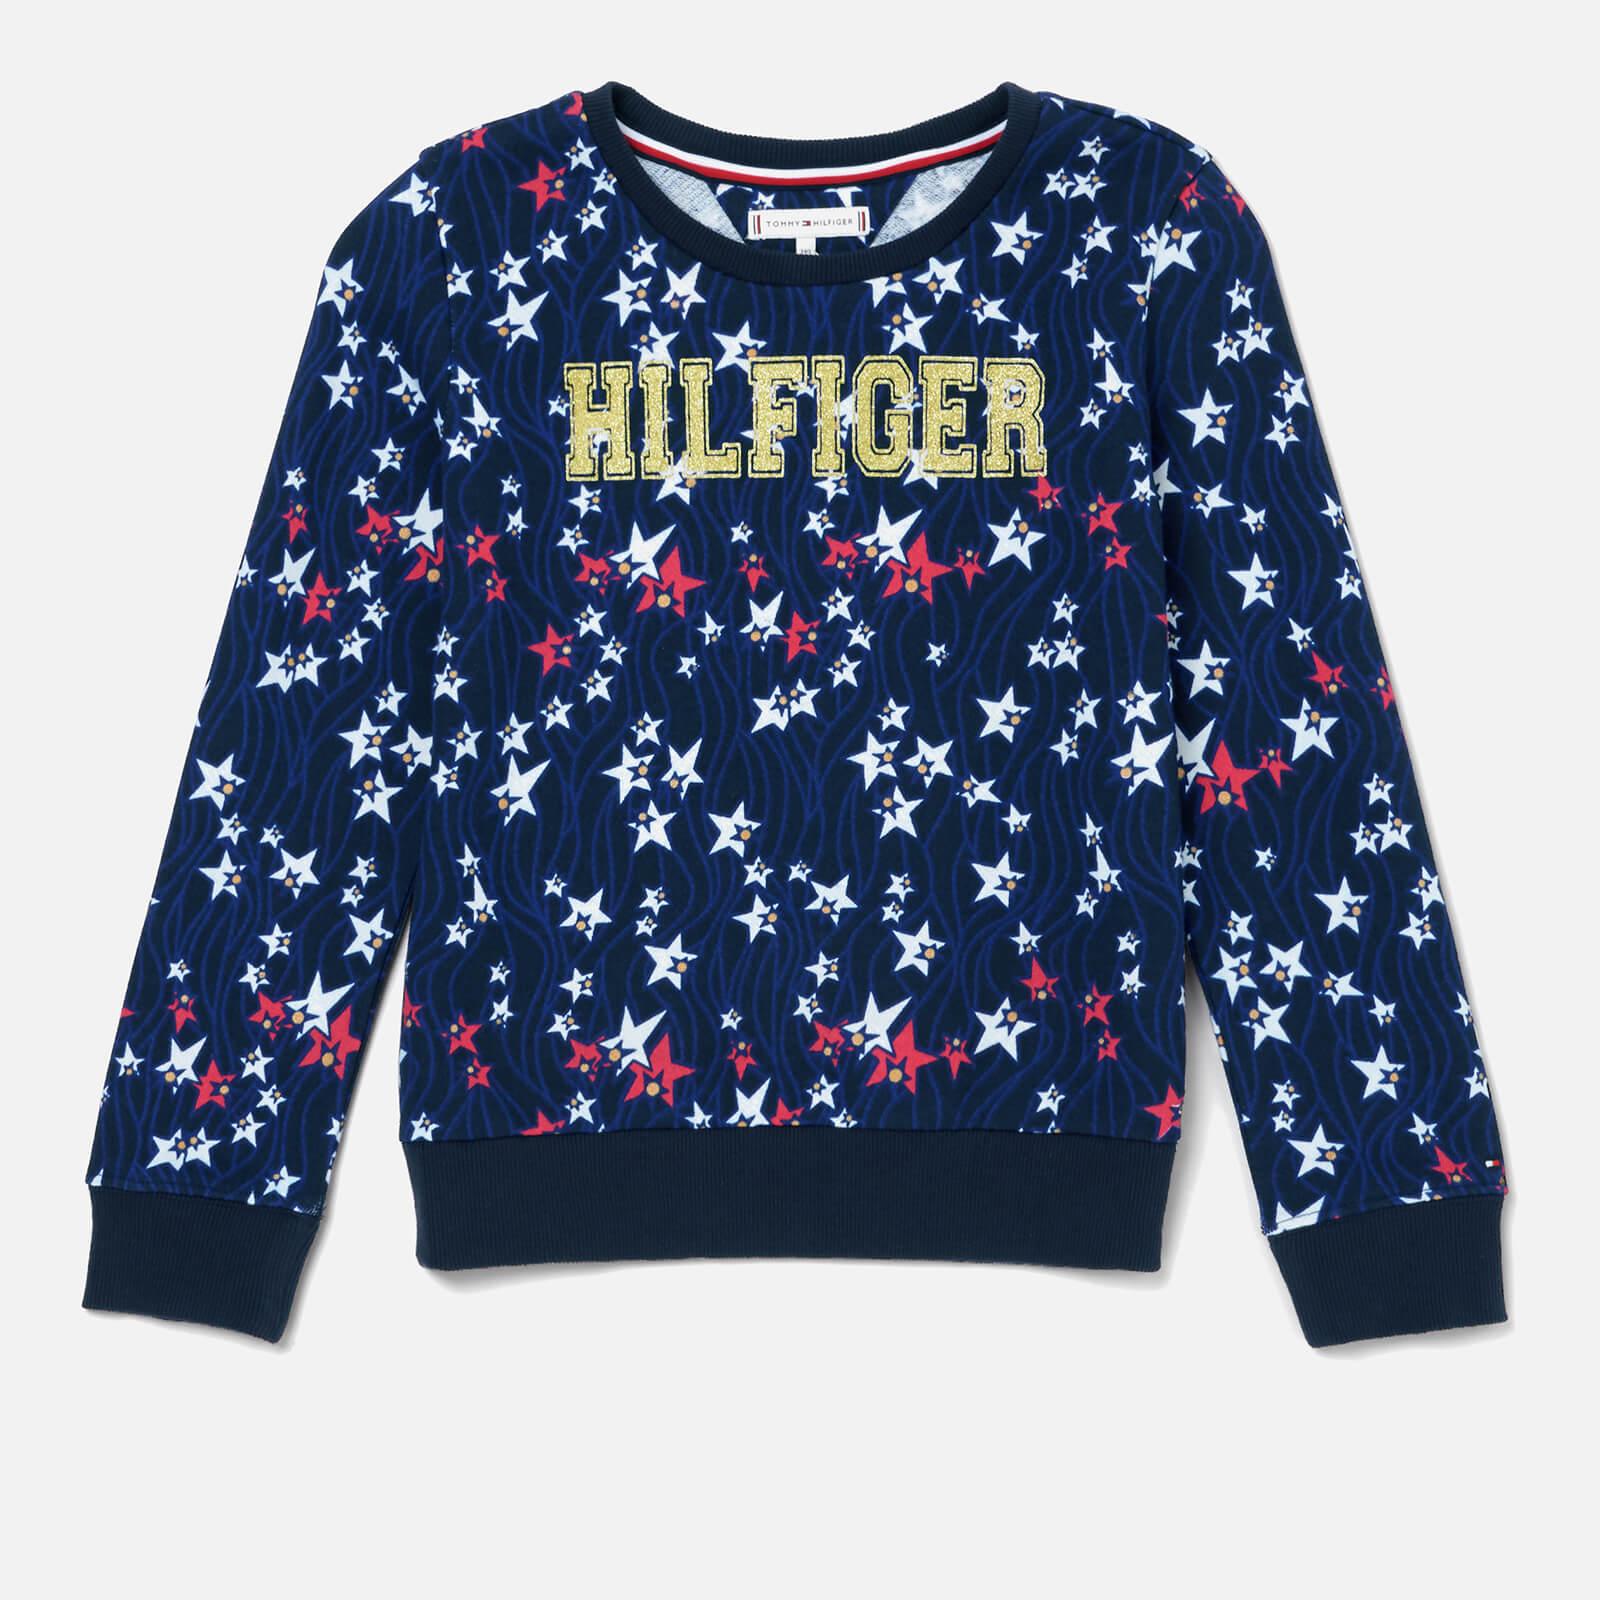 Tommy Hilfiger Girls' Flowing Stars Sweatshirt - Black Iris/Multi - 14 Years - Multi